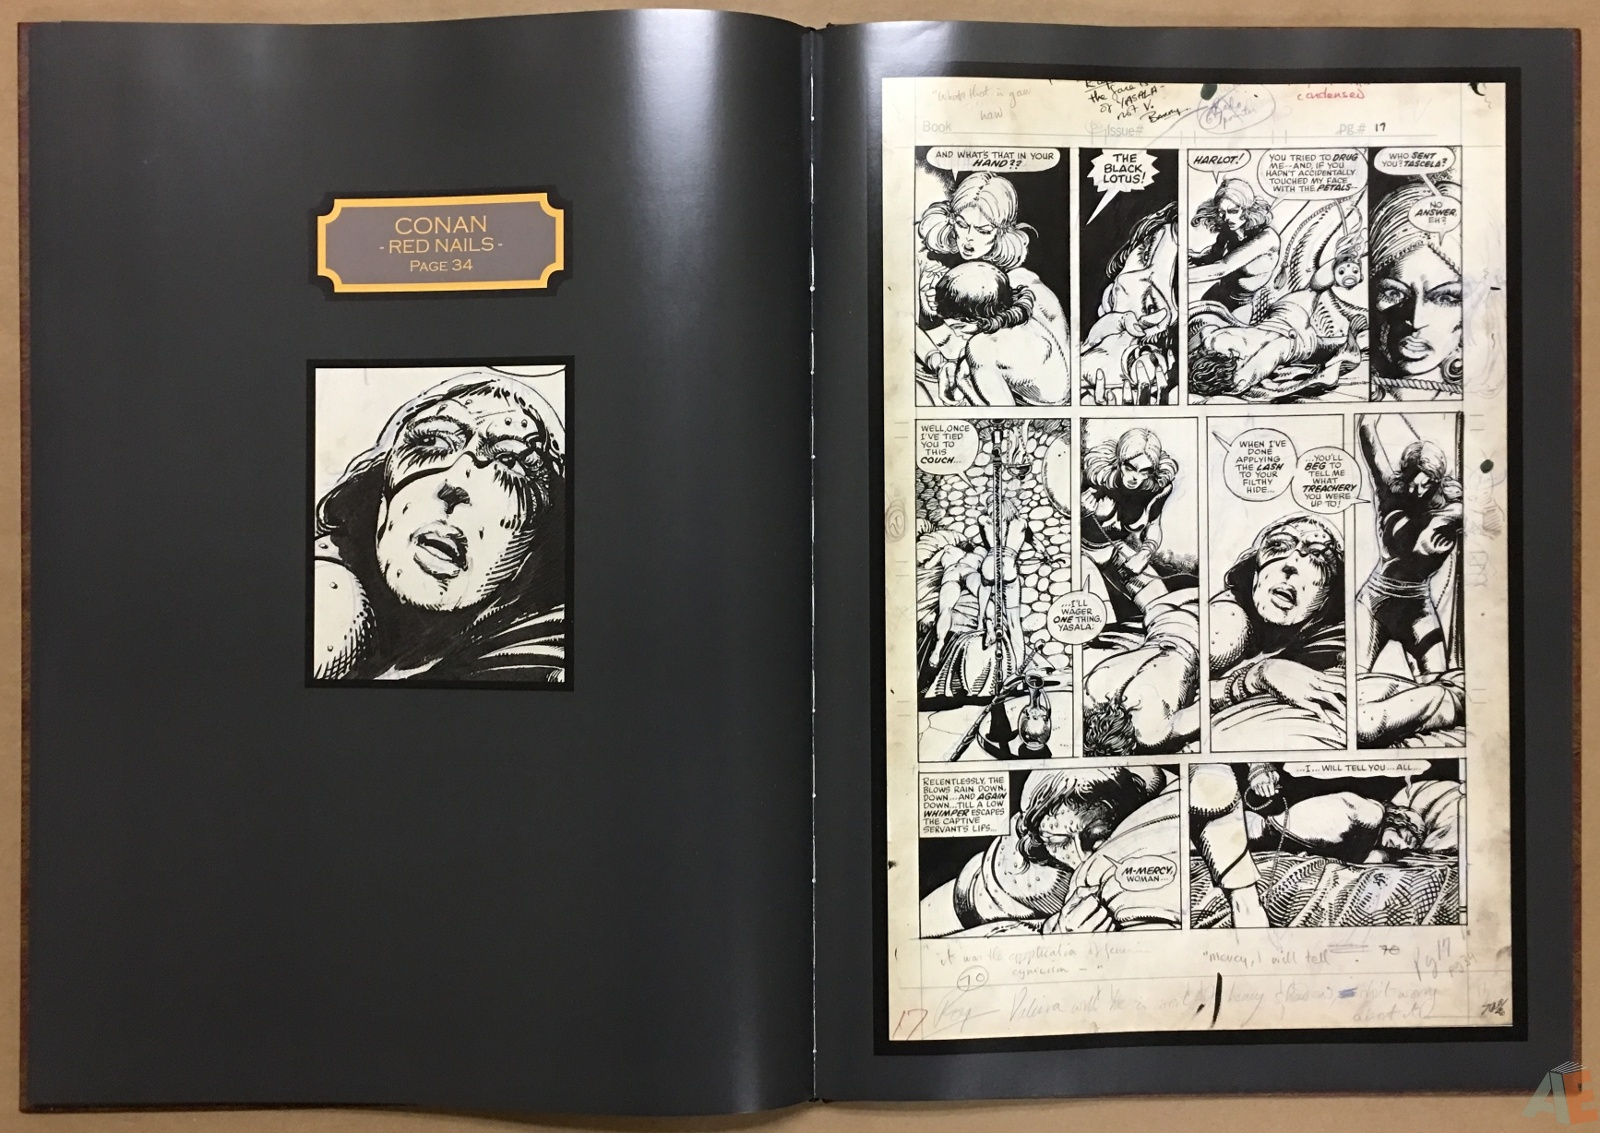 Conan: Red Nails Original Art Archives Volume 1 26